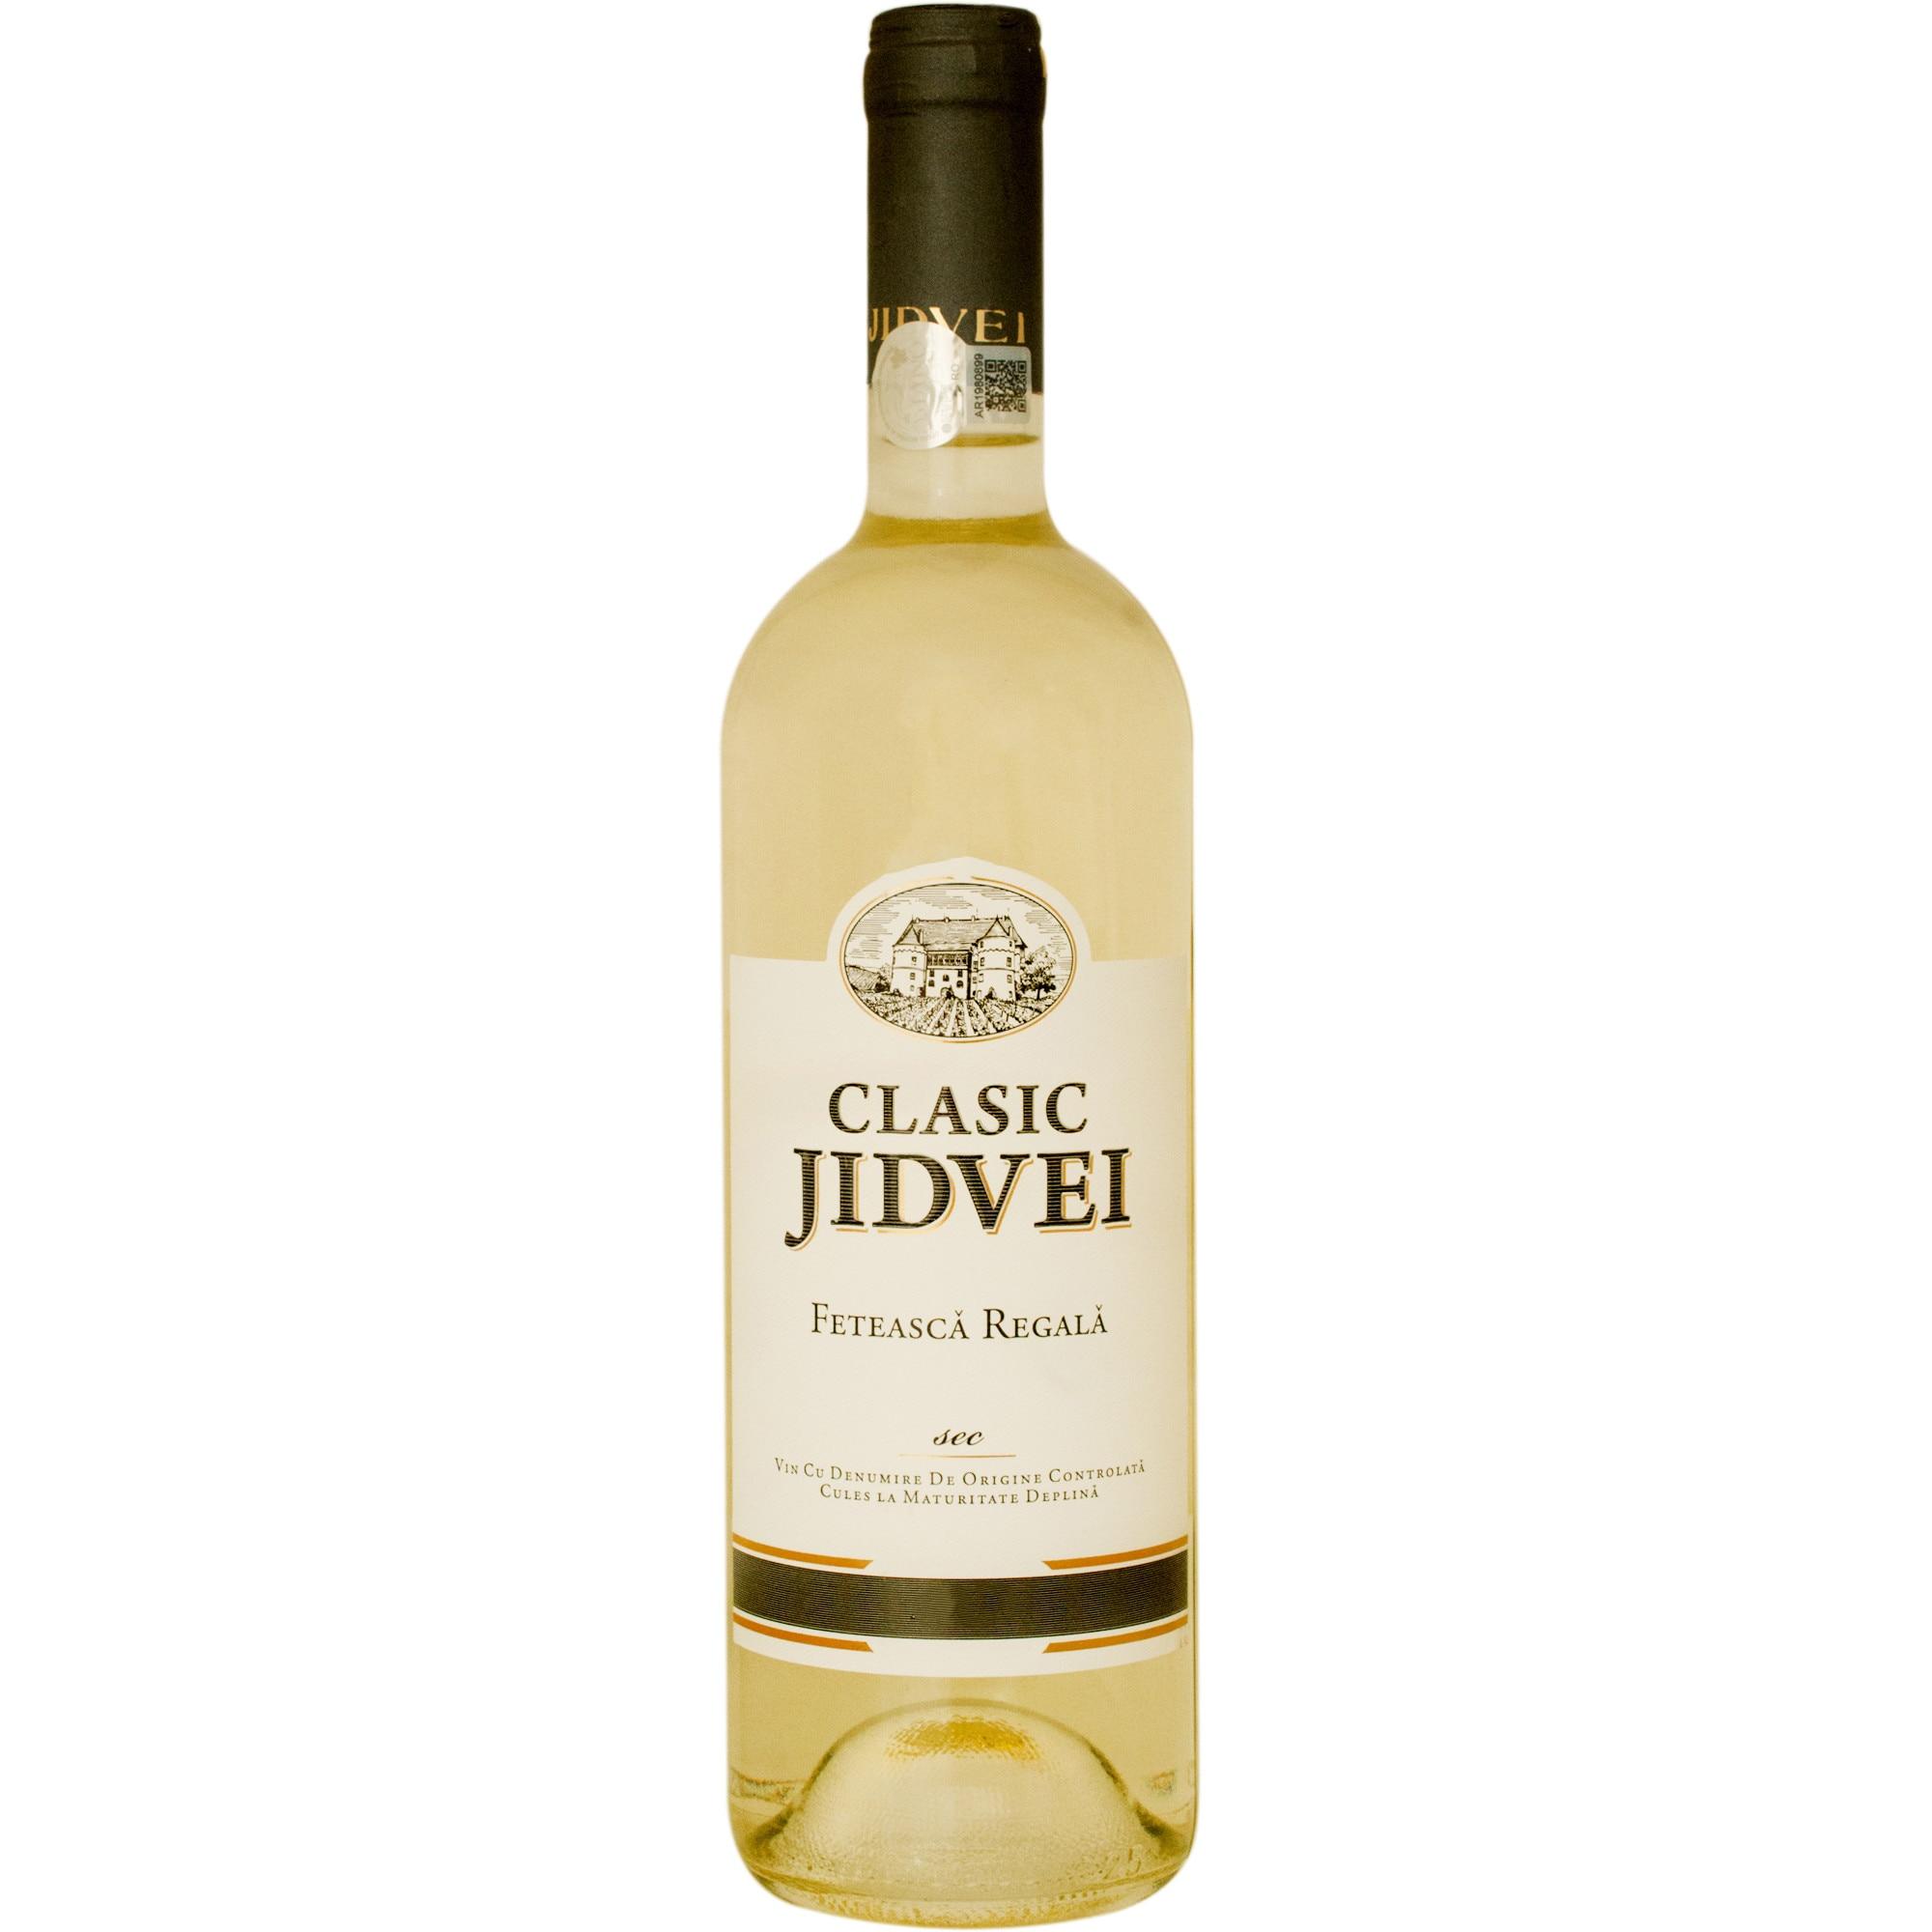 vierme sub vin